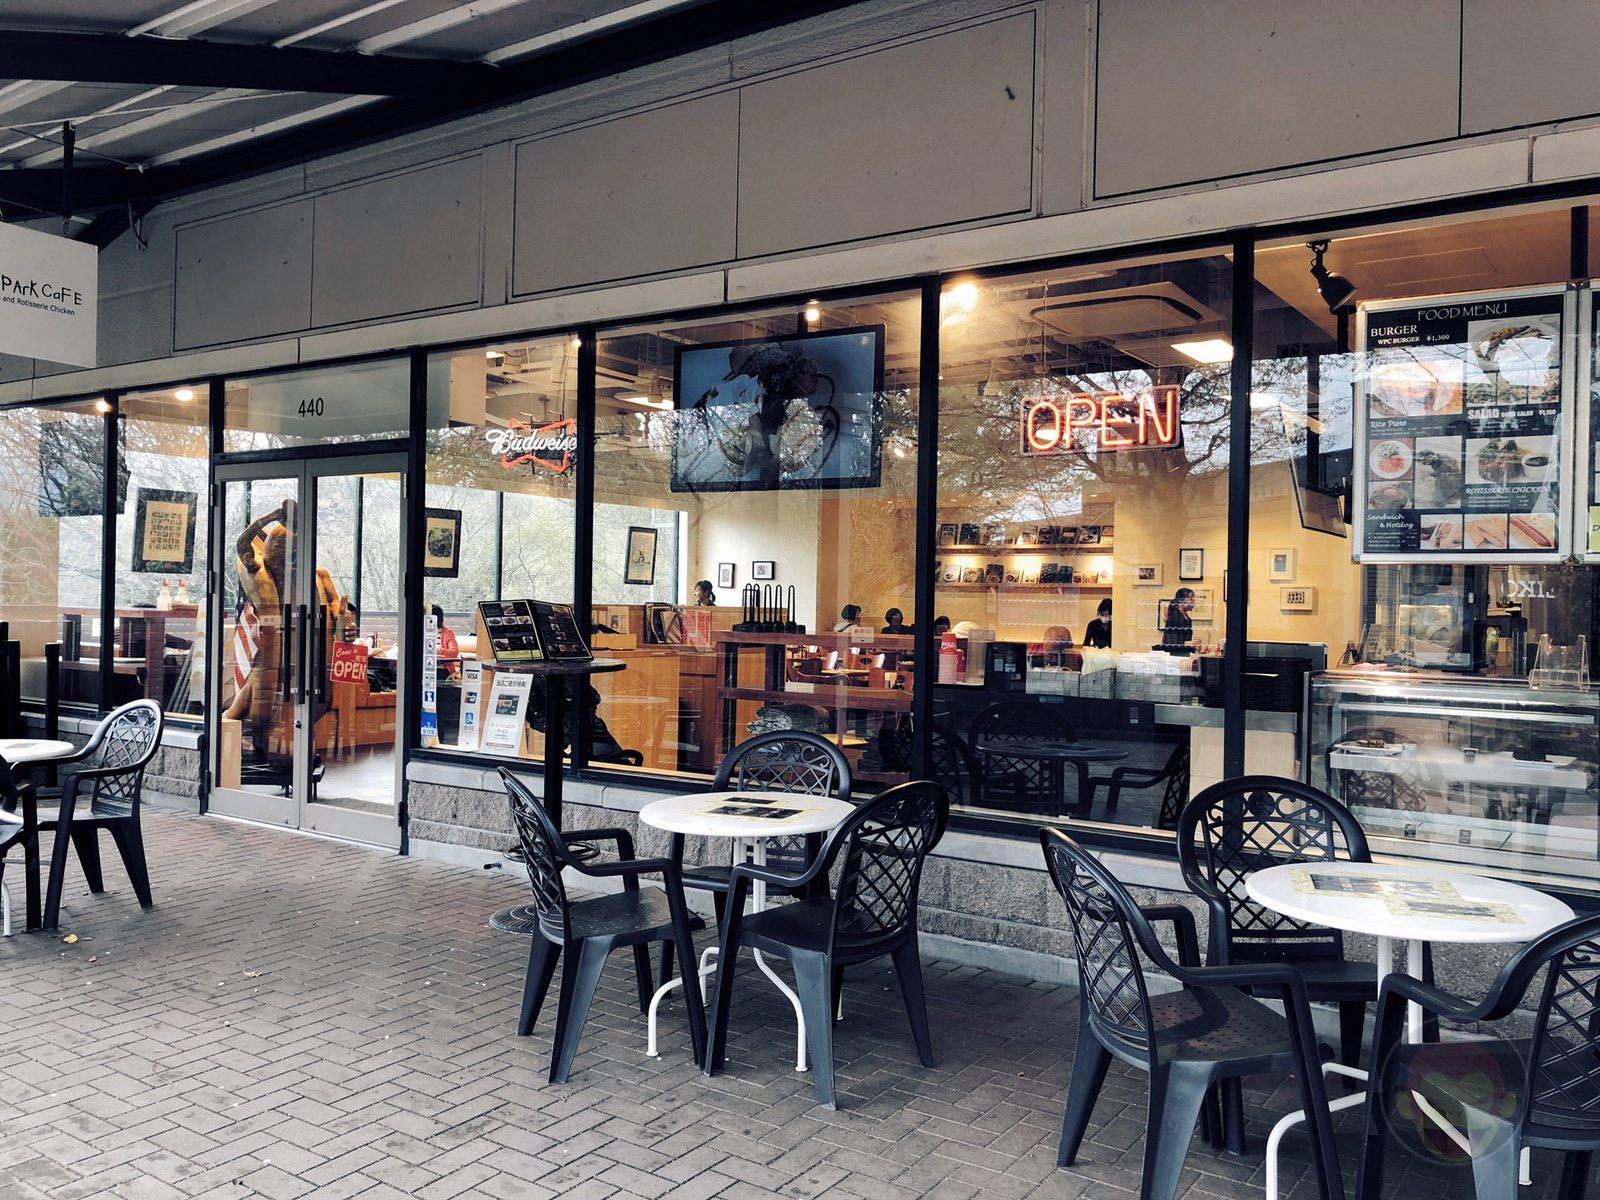 West-Park-Cafe-Gotenba-Outlet-Store-06.jpg